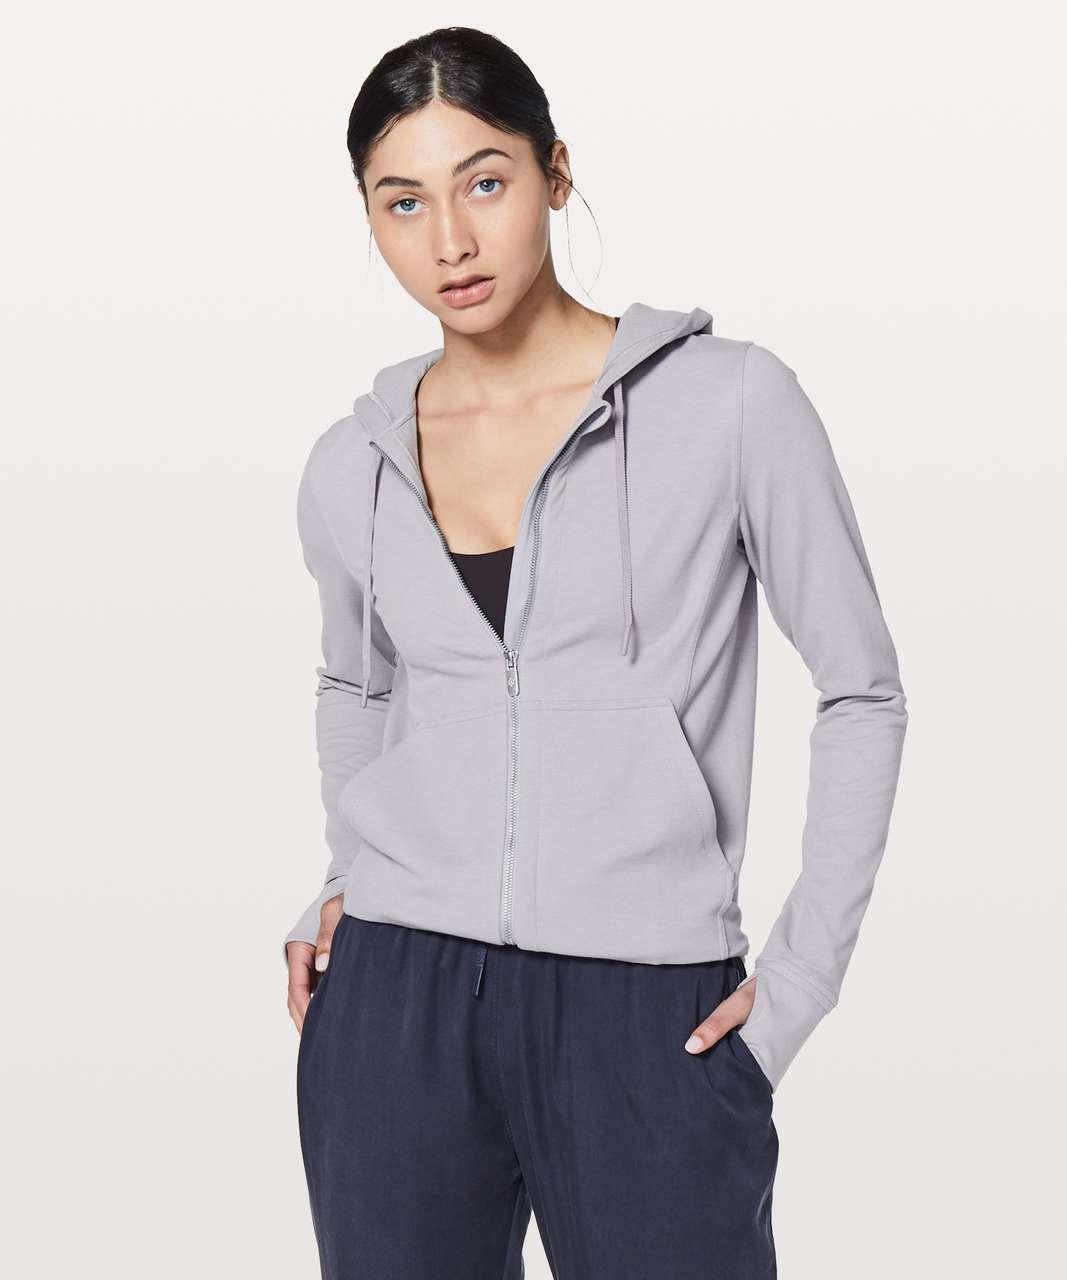 Lululemon Press Pause Jacket - Lavender Grey